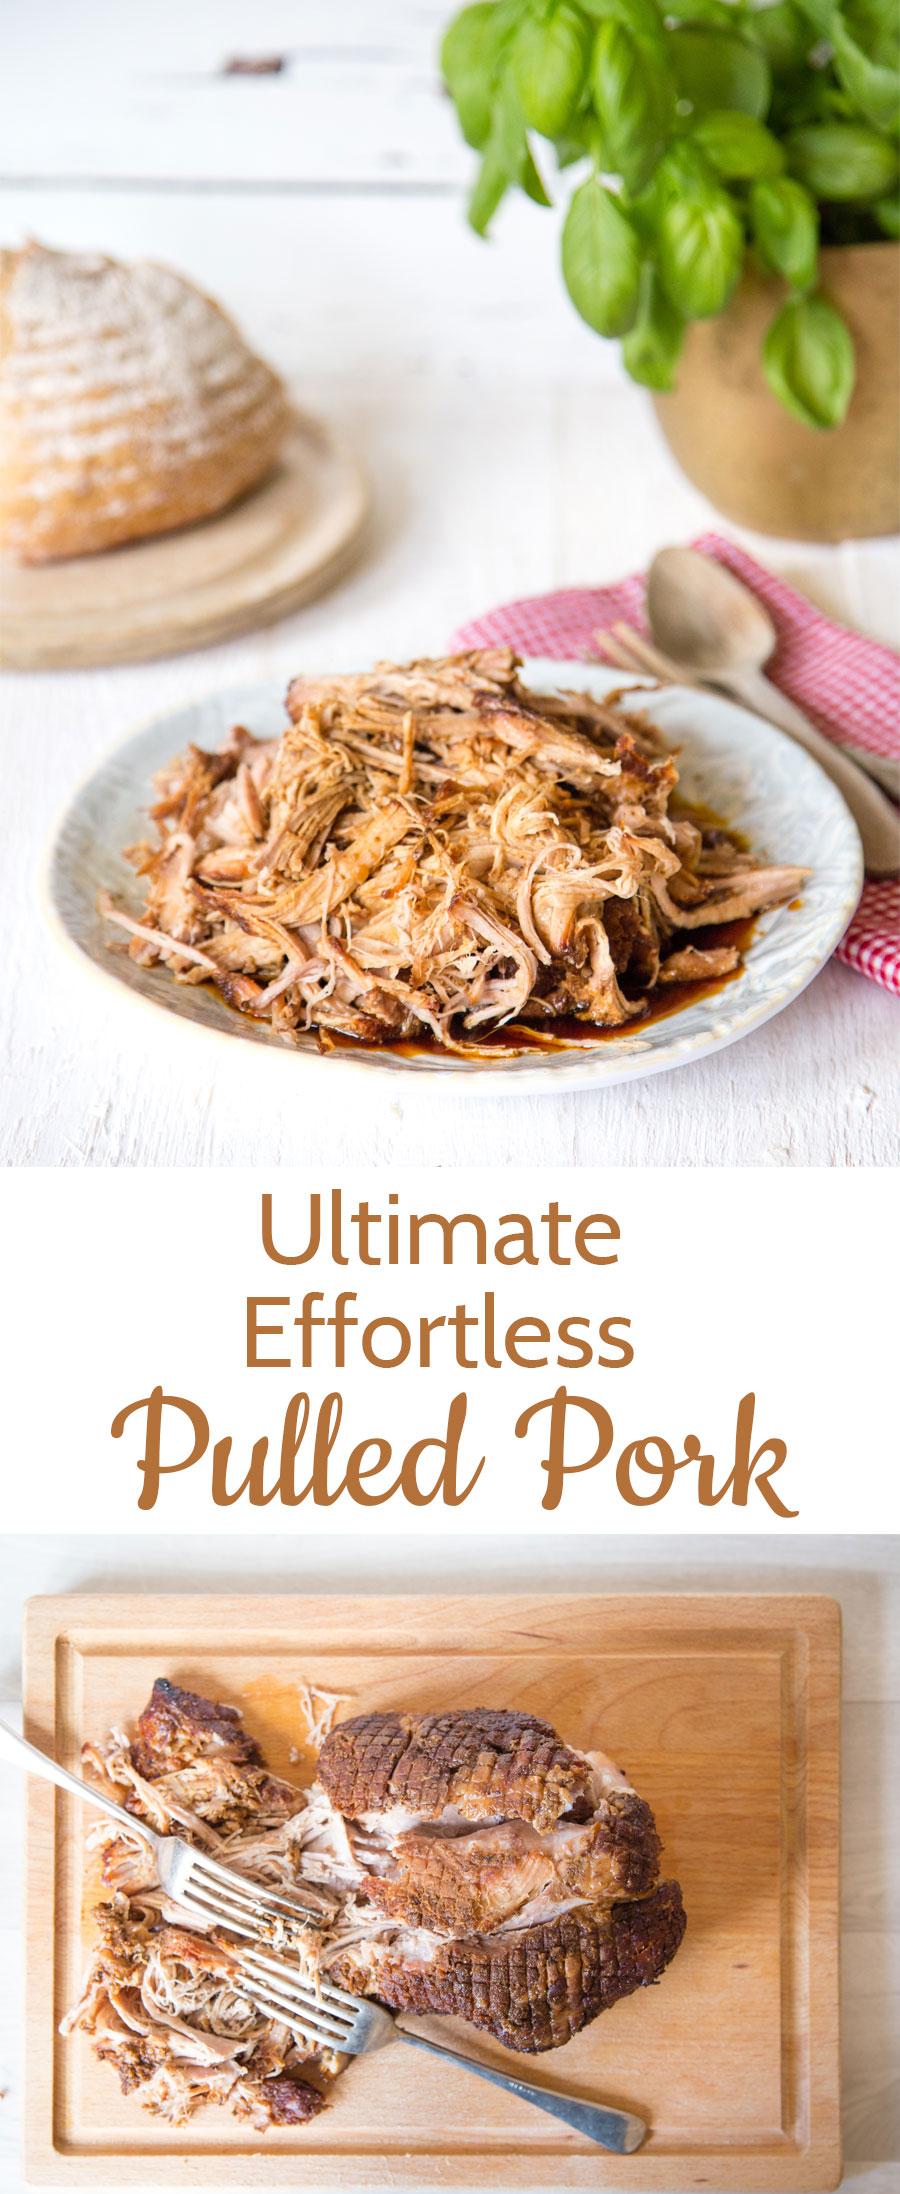 The Ultimate Pulled Pork Slow Cooker Crock Pot. A super simple effortless recipe.